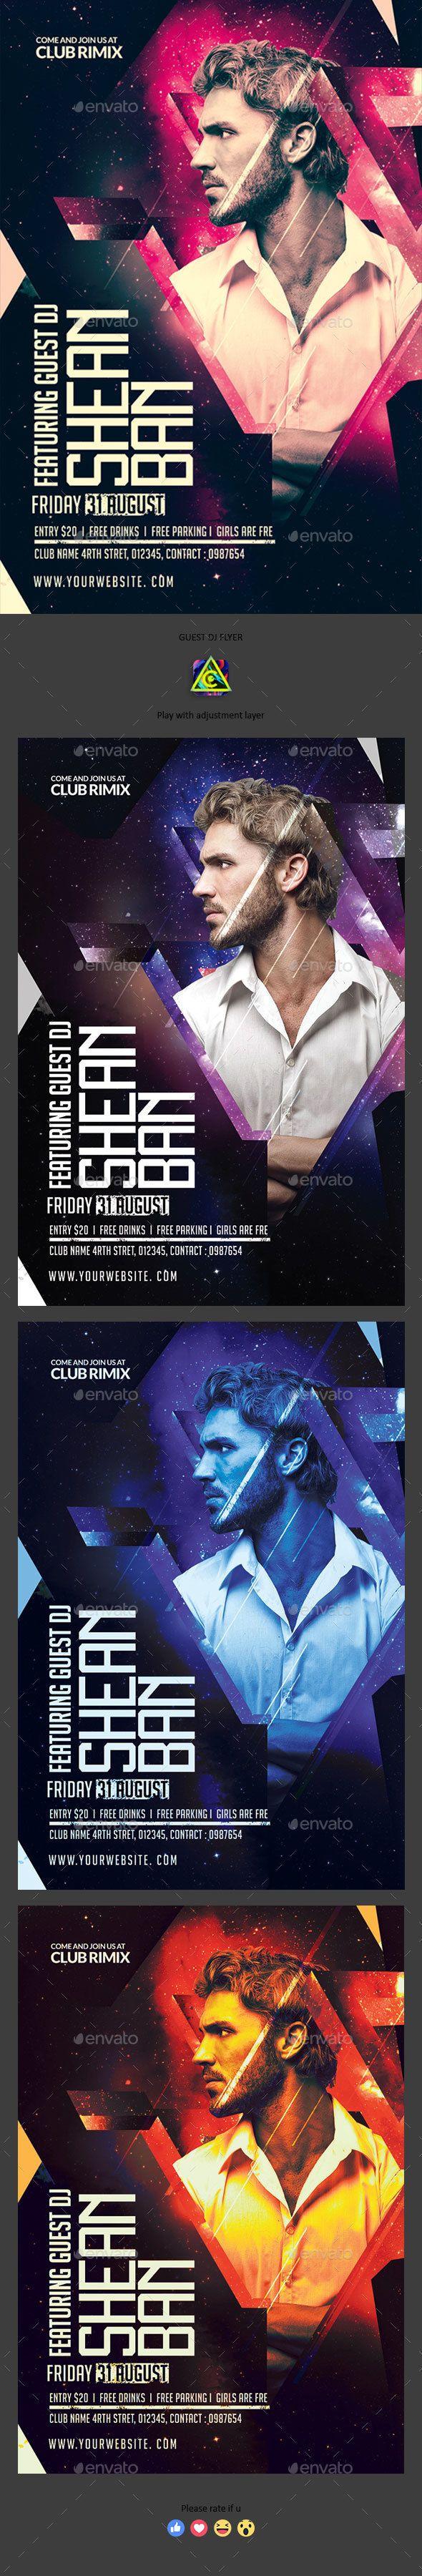 Guest DJ #Flyer - Clubs & Parties Events Download here:  https://graphicriver.net/item/guest-dj-flyer/20014603?ref=alena994